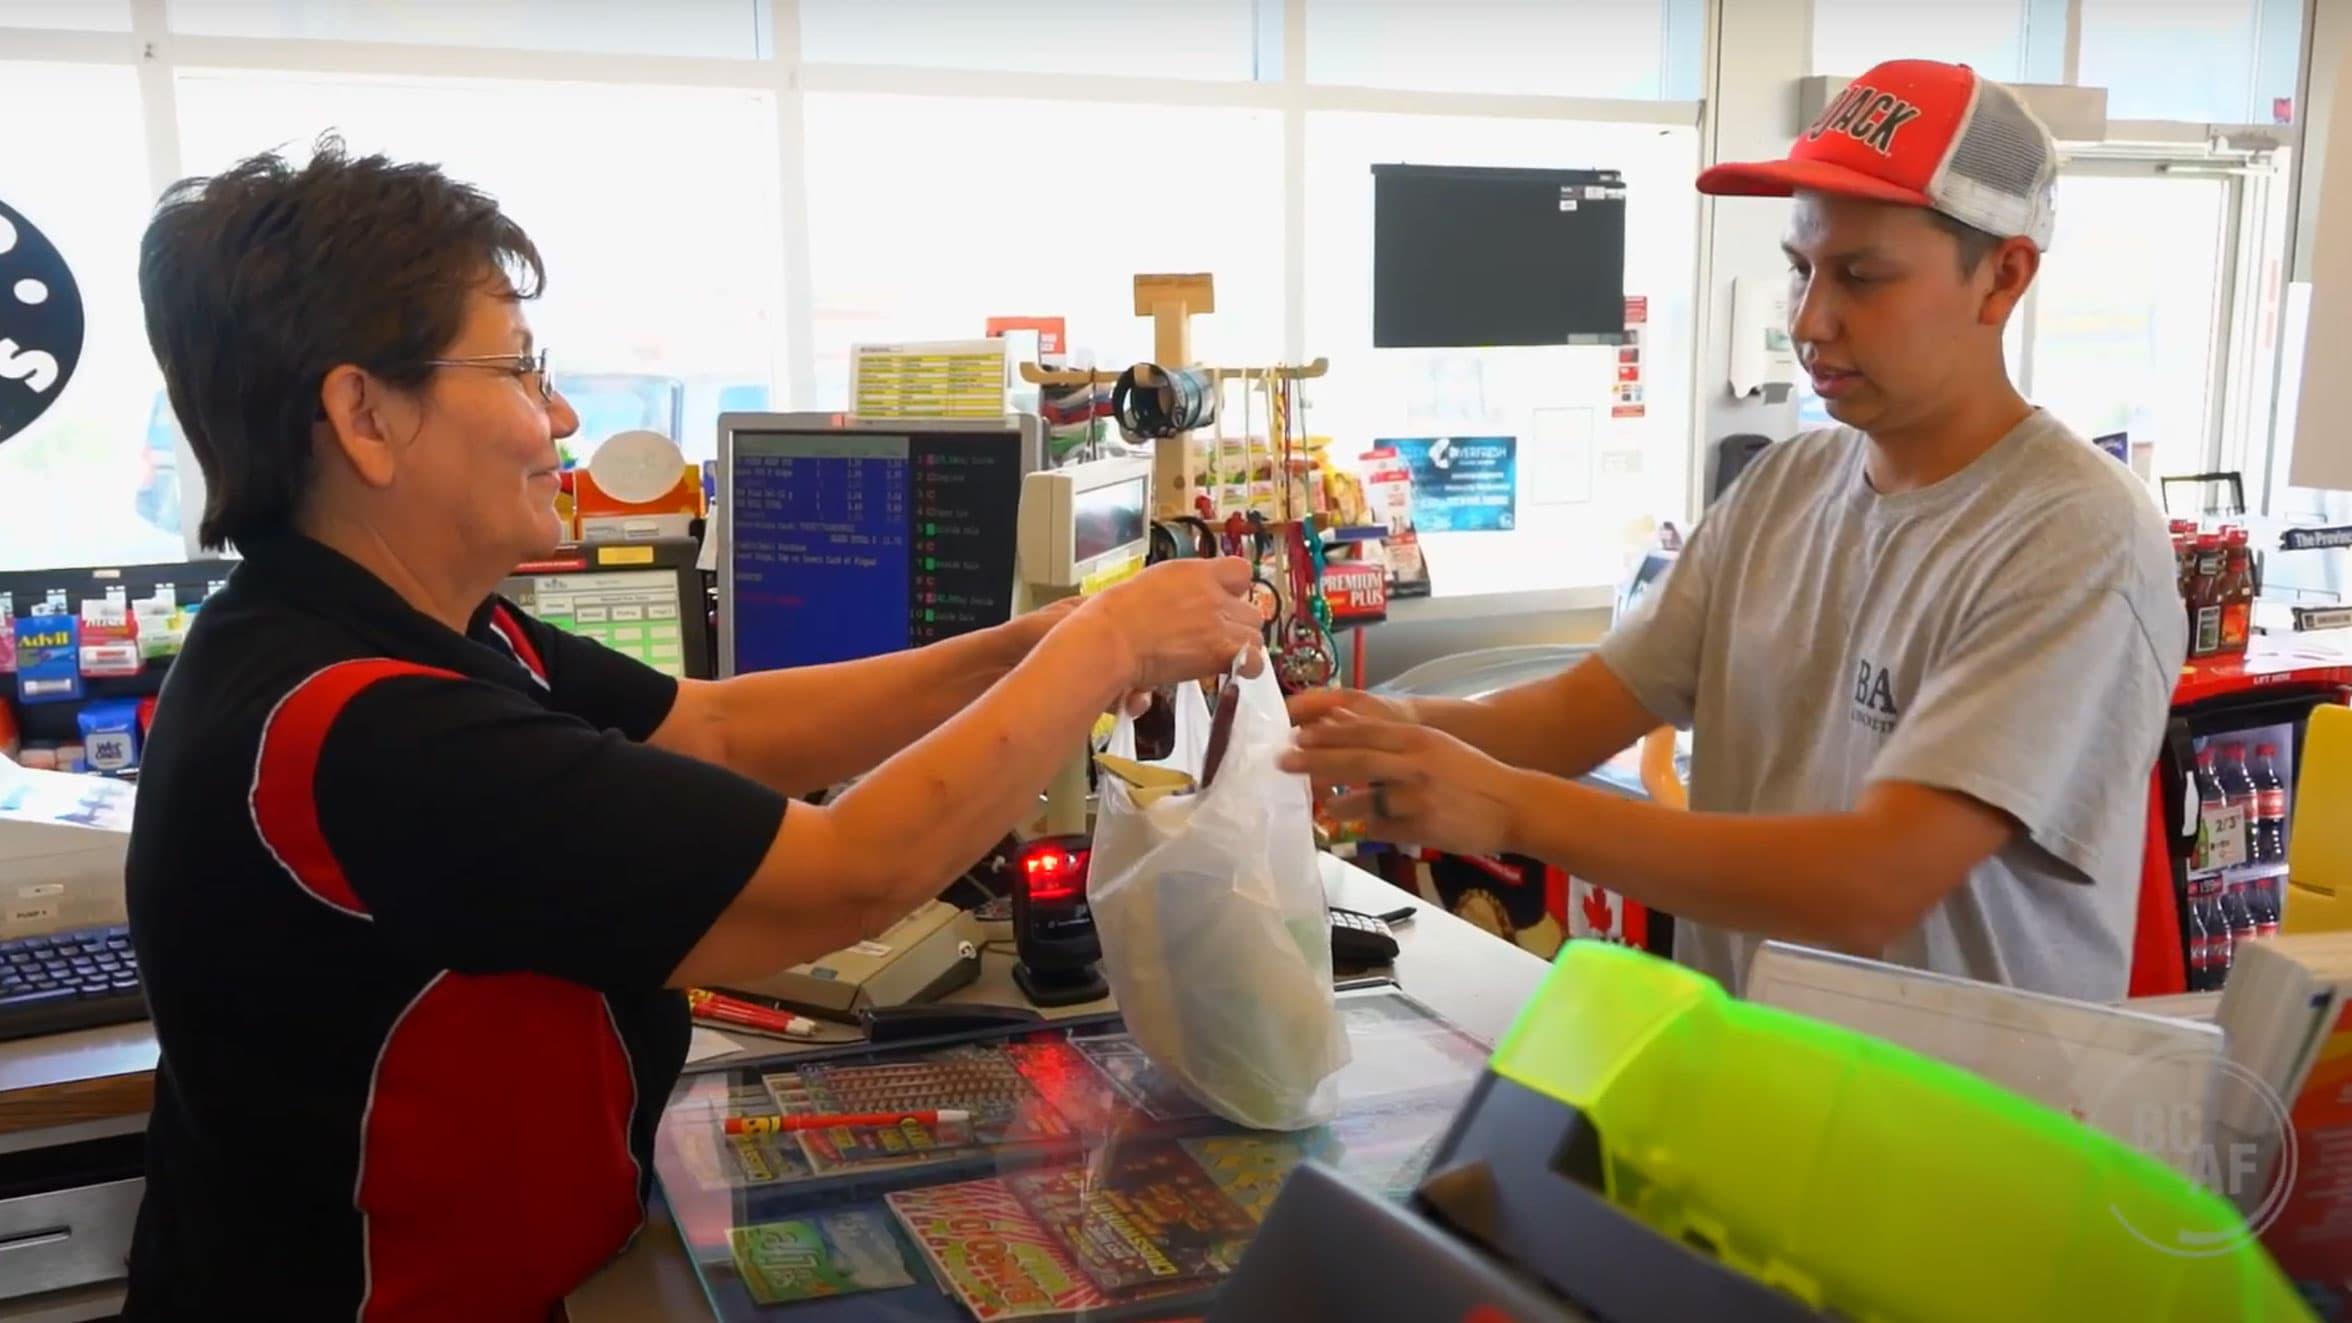 A Petro-Canada customer helps a guest.